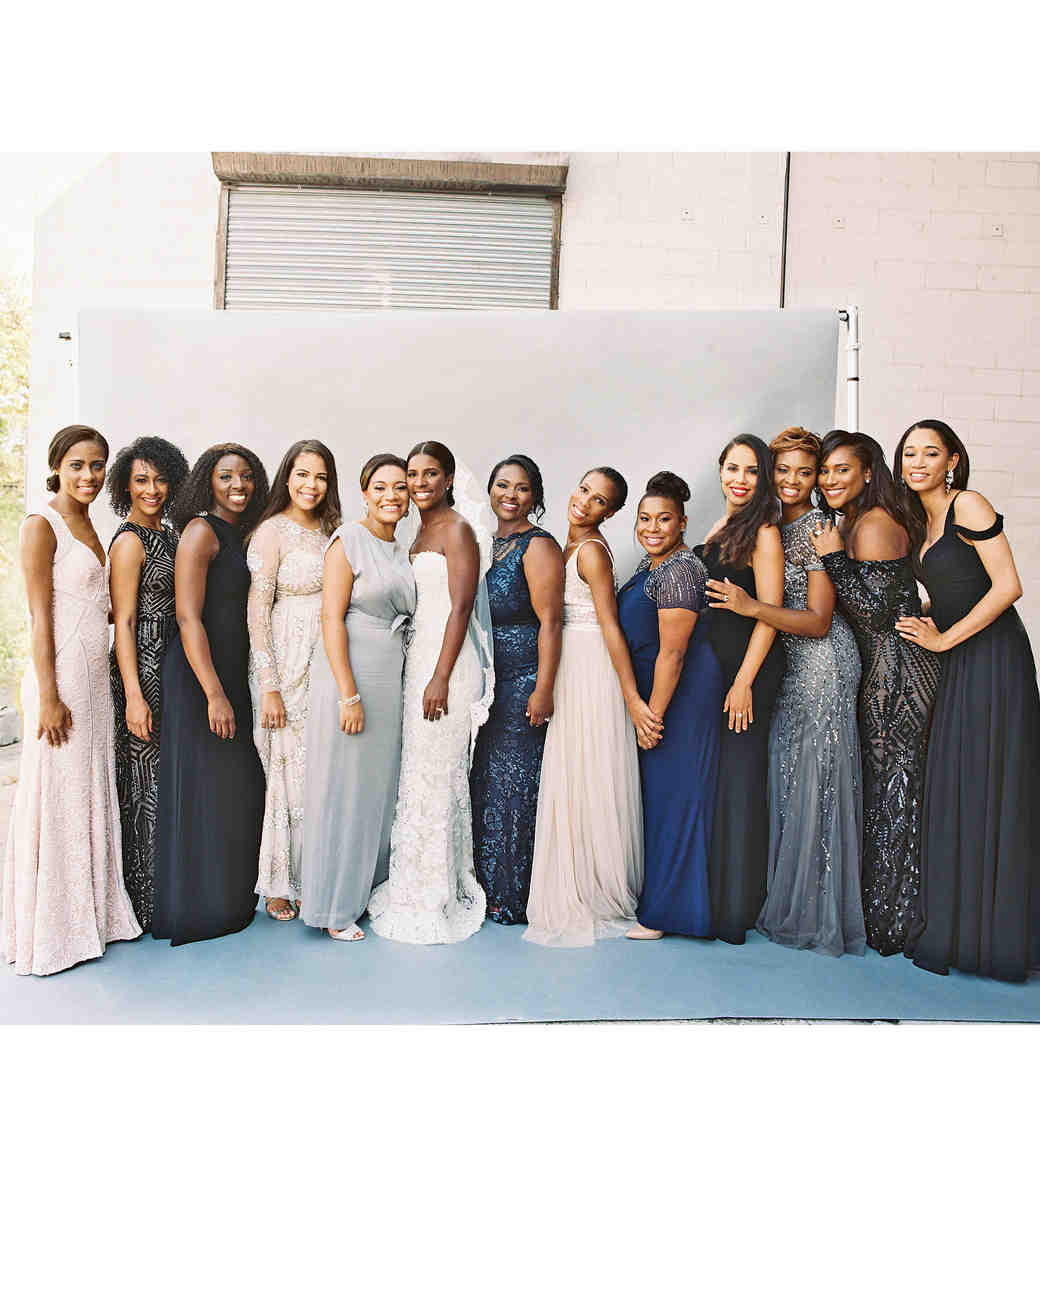 lindsey william wedding dc bridesmaids